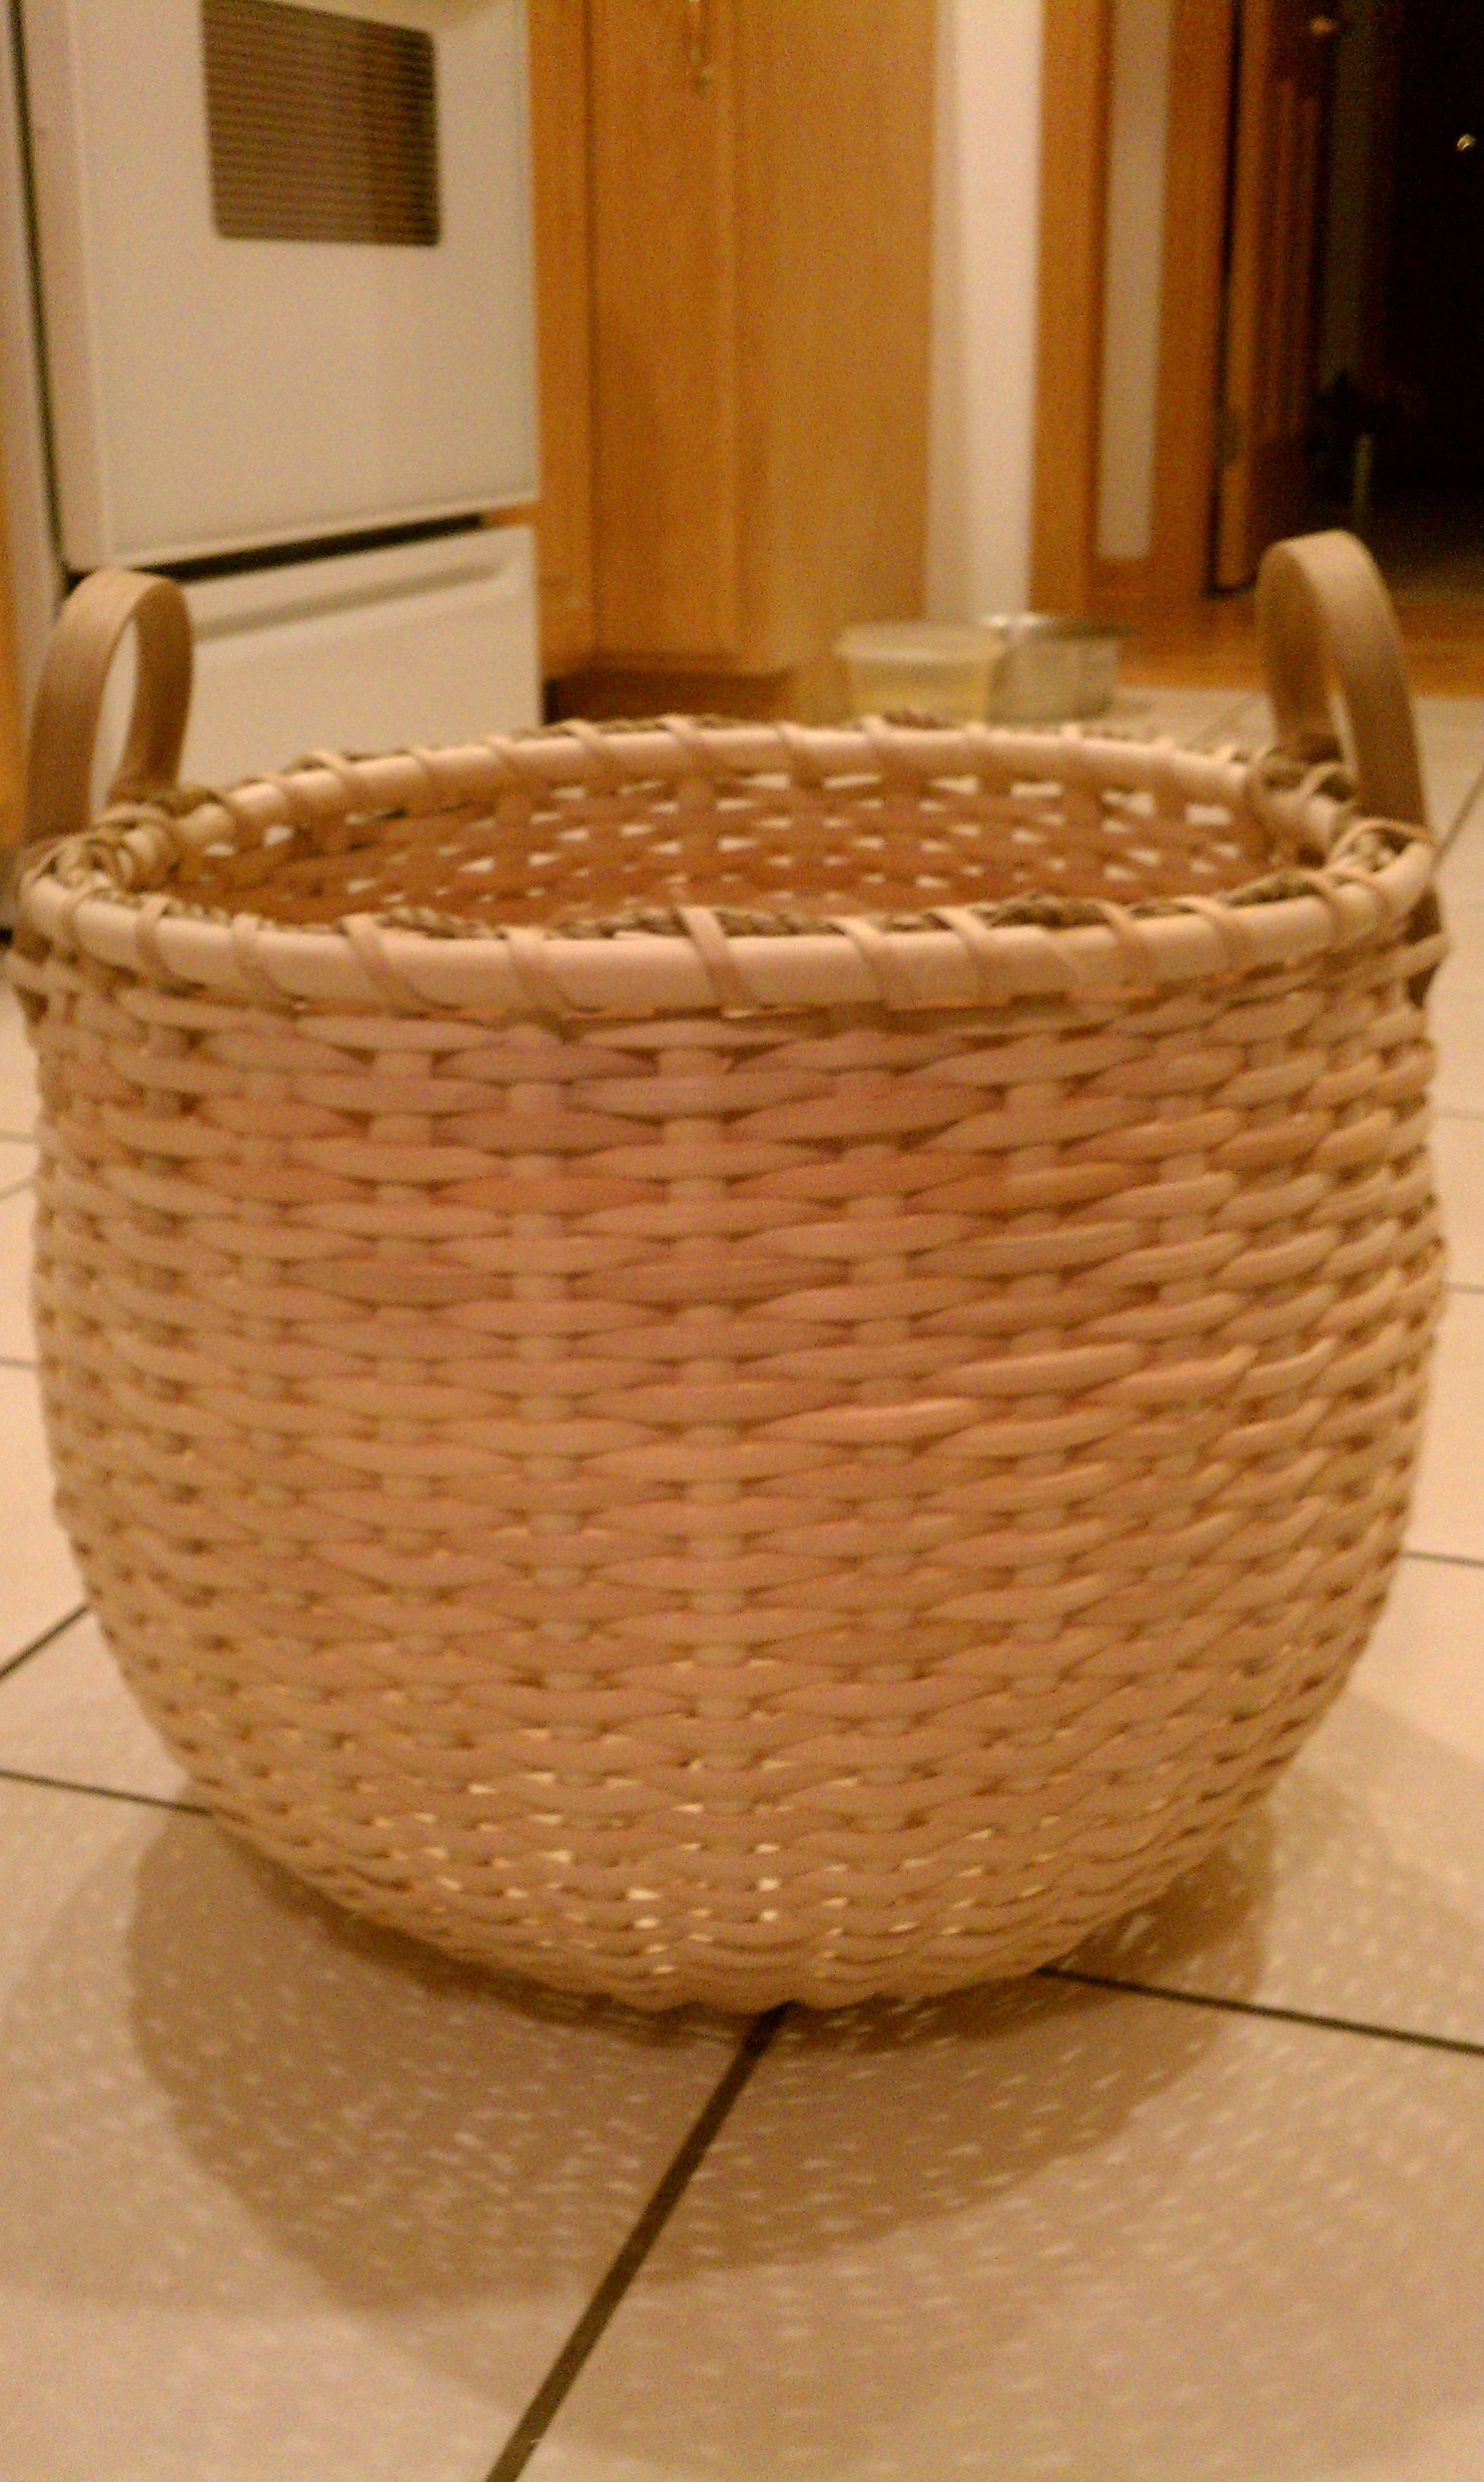 1 2 Bushel Basket Handmade By Me Would Love To Have This Basket It Is Beautiful D Basket Weaving Basket Handmade Baskets